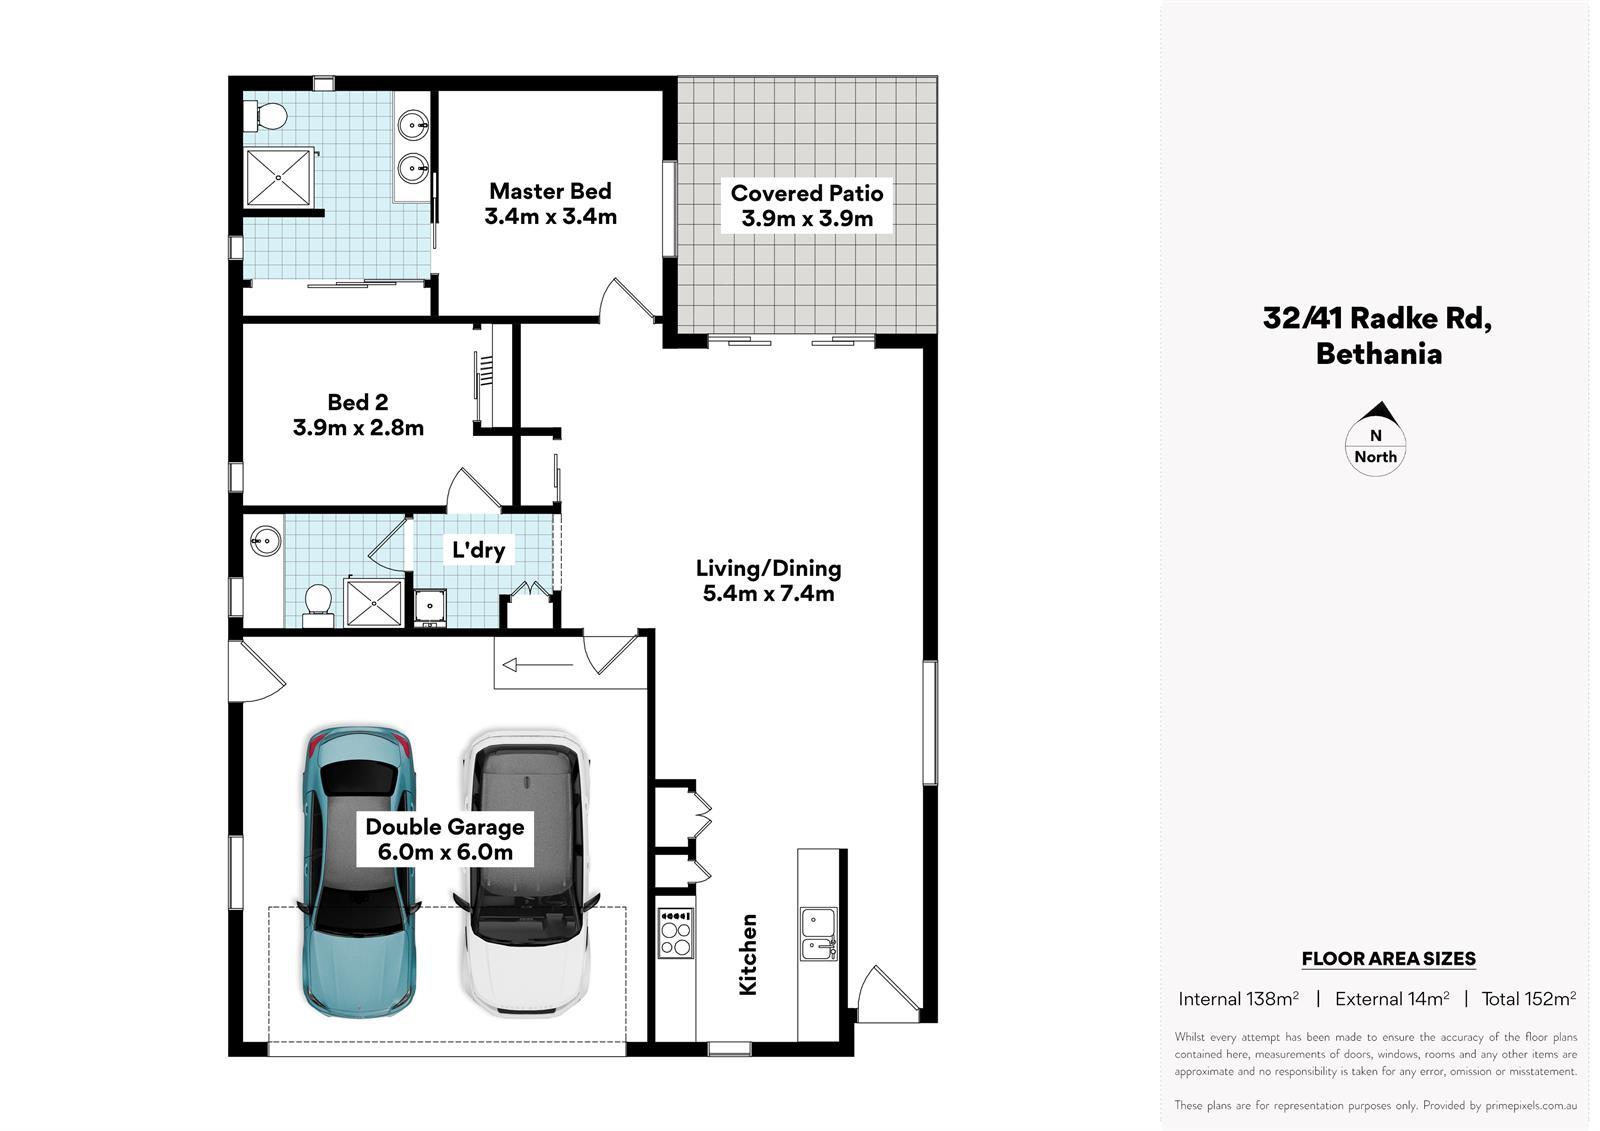 32 / 41 Radke Road BETHANIA QLD 4205 Floorplan 1